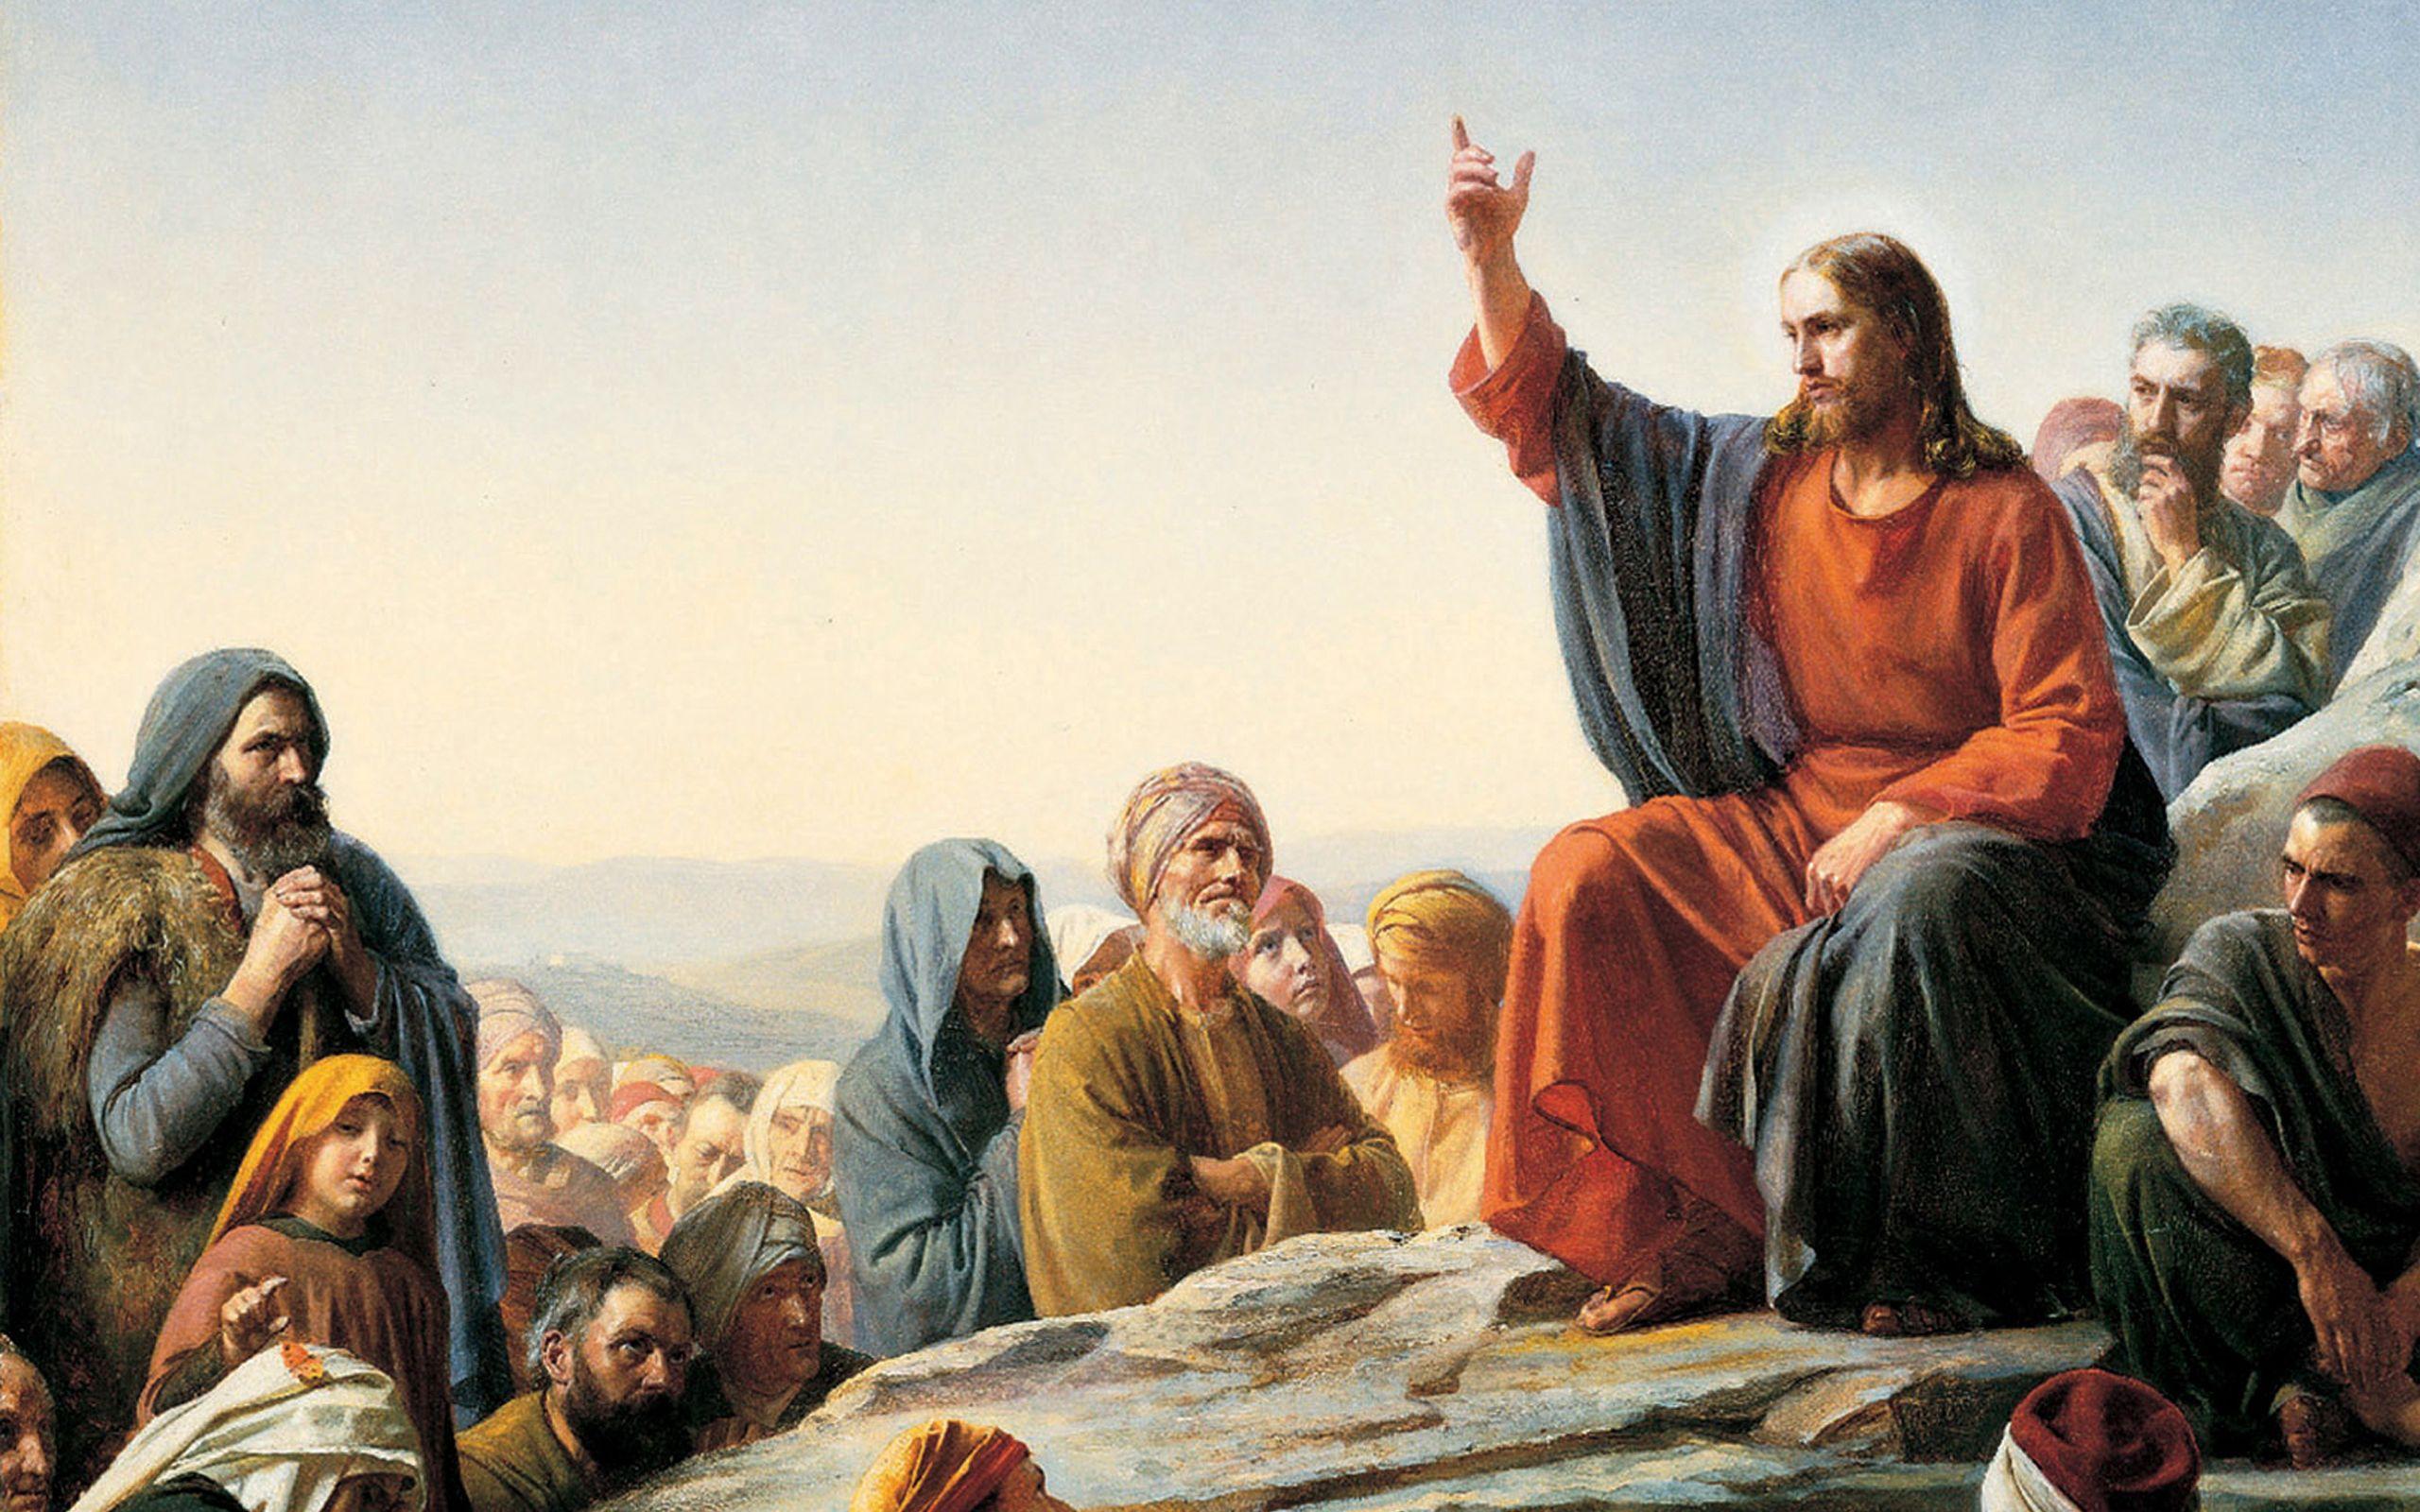 Jesus Christ Wallpaper Jesus Teaching Multitude Wallpaper 2560x1600